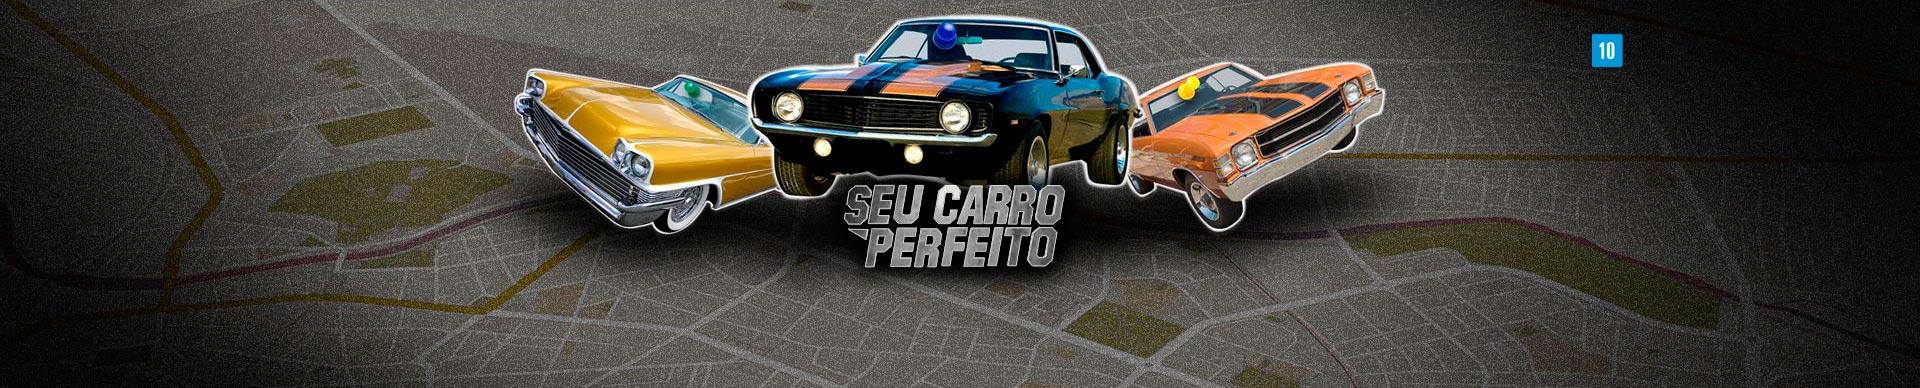 SEU CARRO PERFEITO